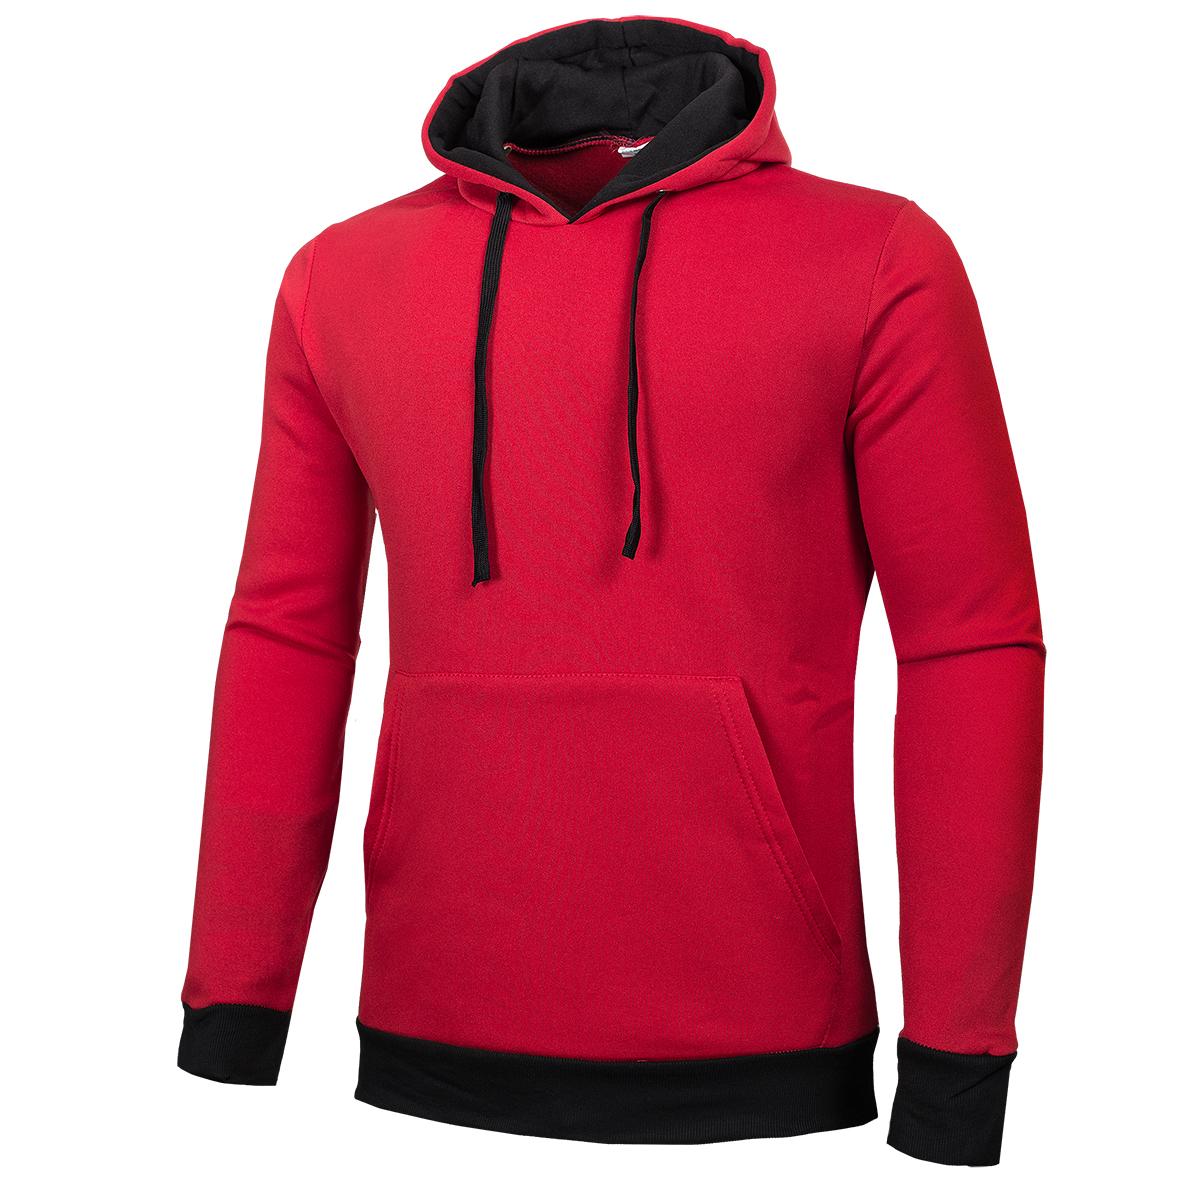 Sudaderas Hombre 2016 Hoodies and Sweatshirt Men Long Sleeve Solid Turtleneck Fashion Slim Men Sweatshirts(China (Mainland))